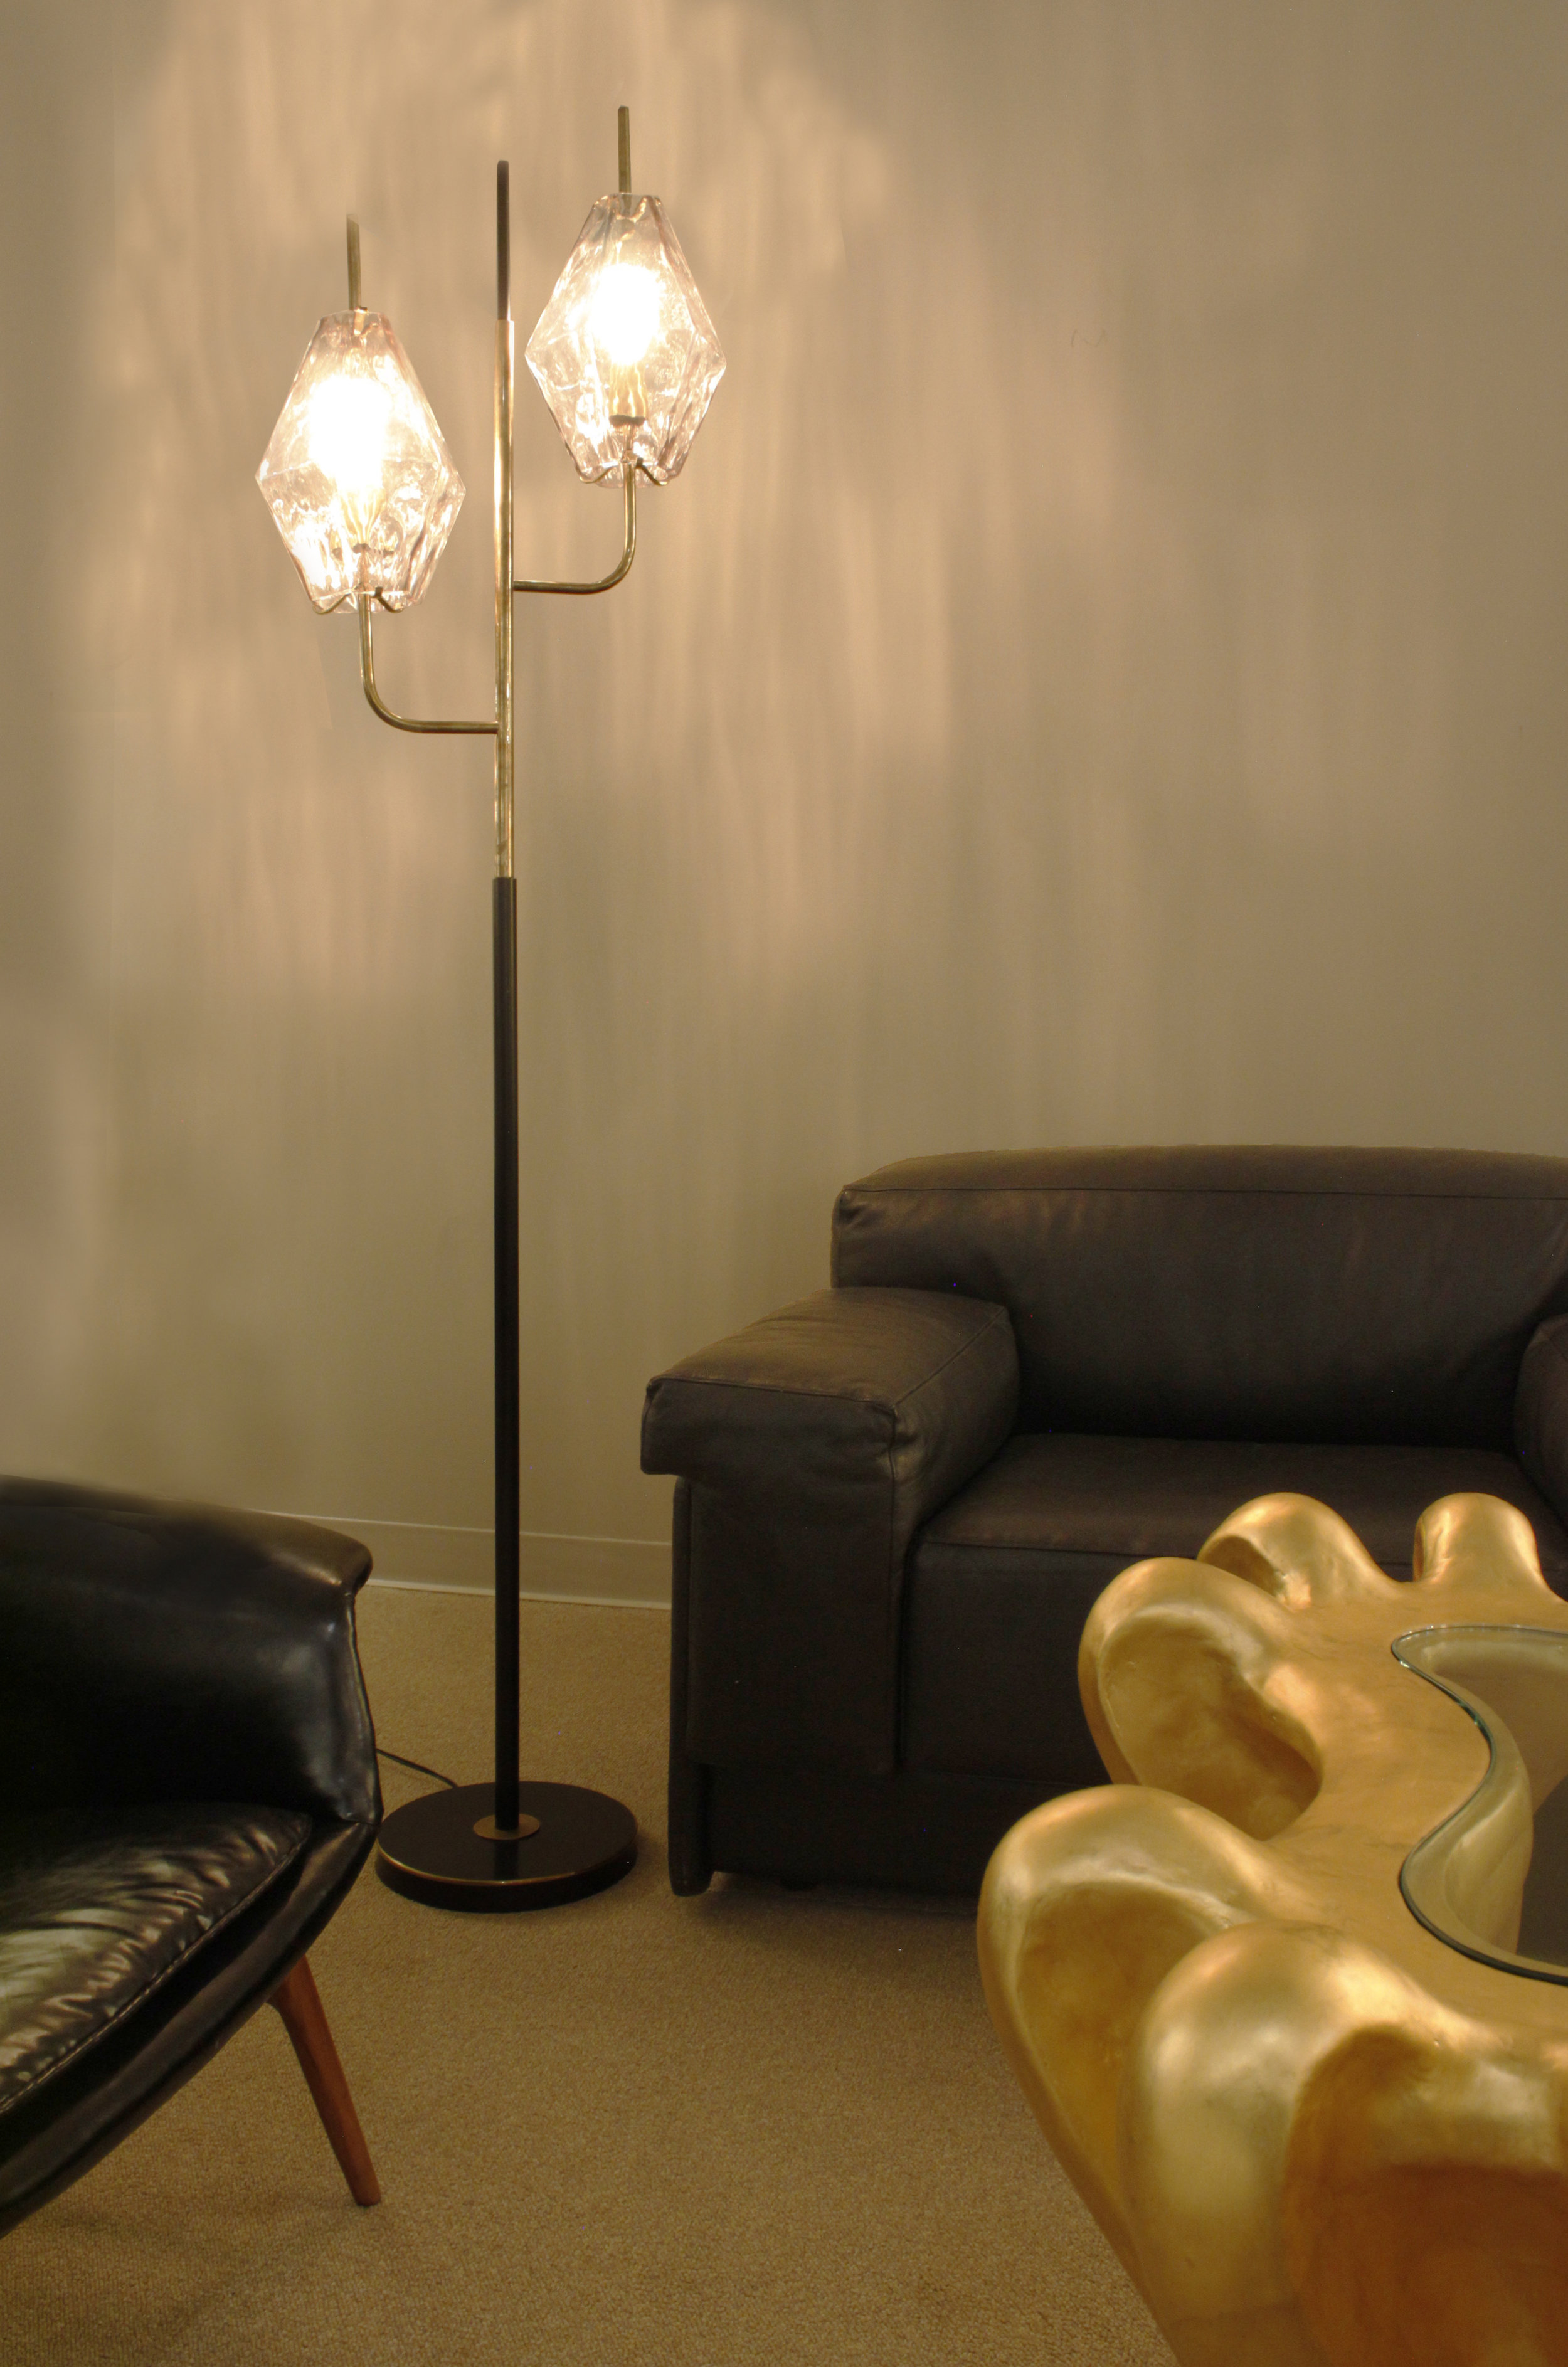 Venini 95 Poliedri floorlamp186 atm.jpg